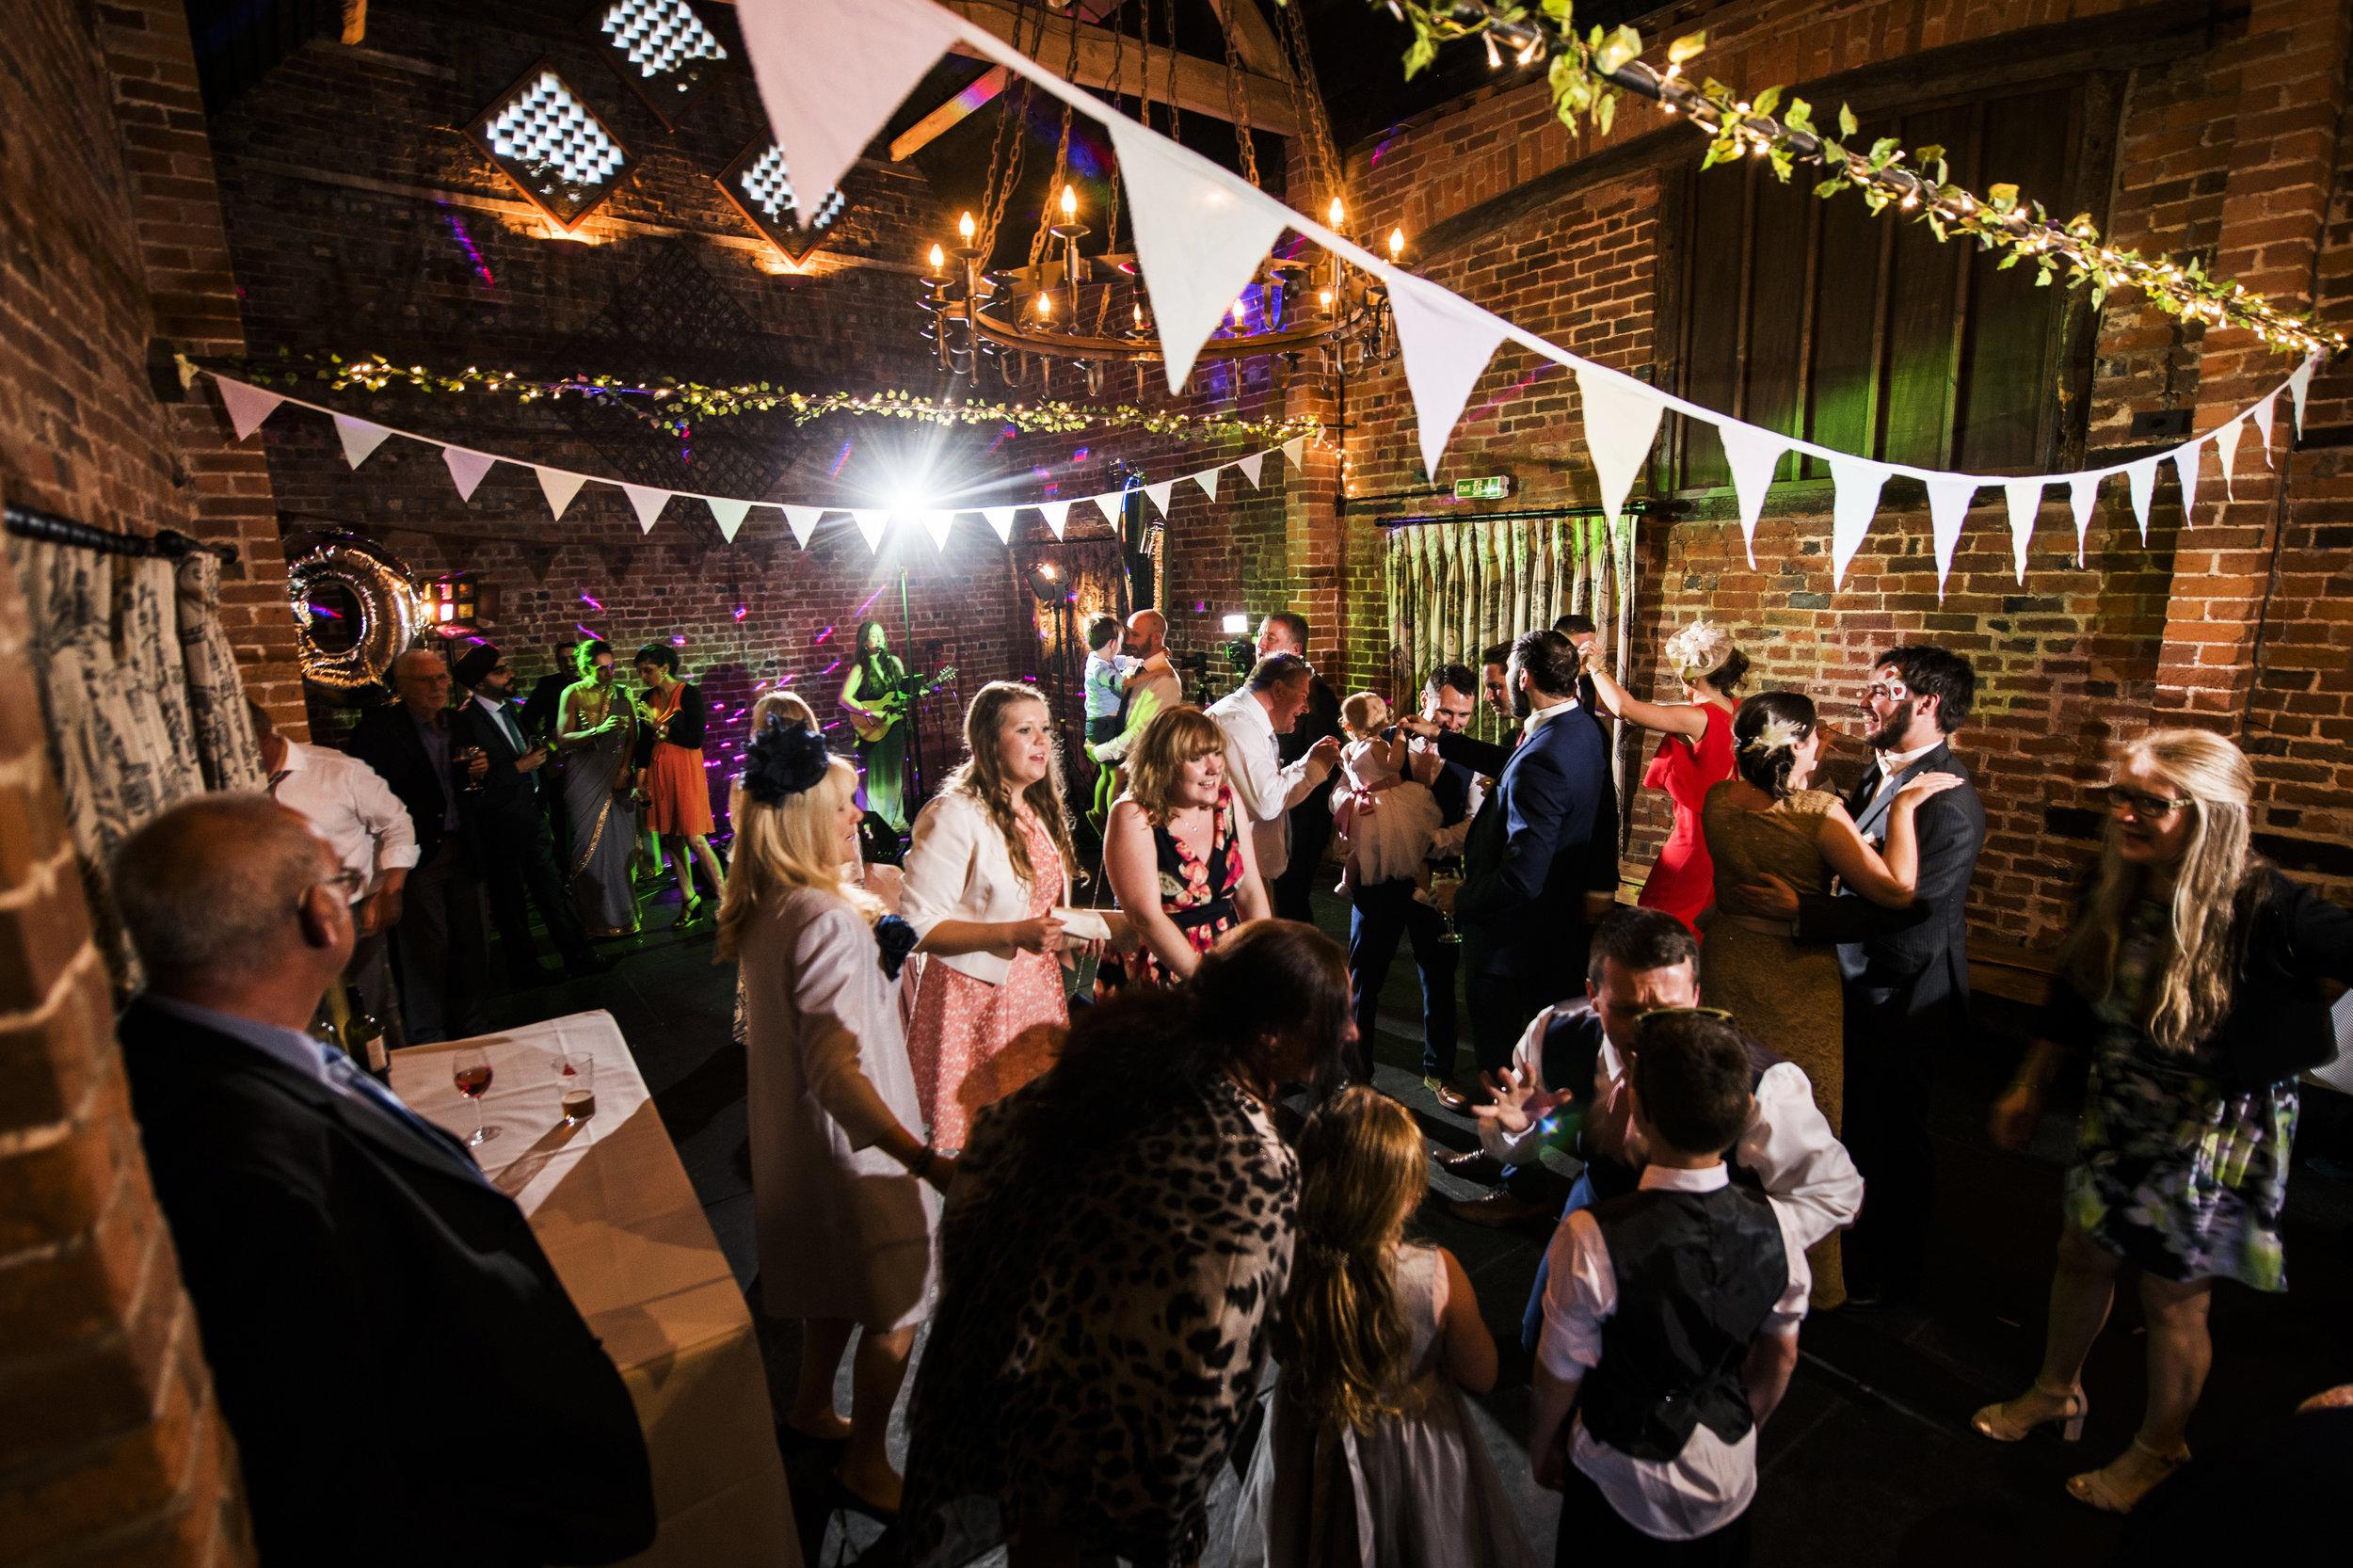 Curradine Barn wedding band | The Distancw